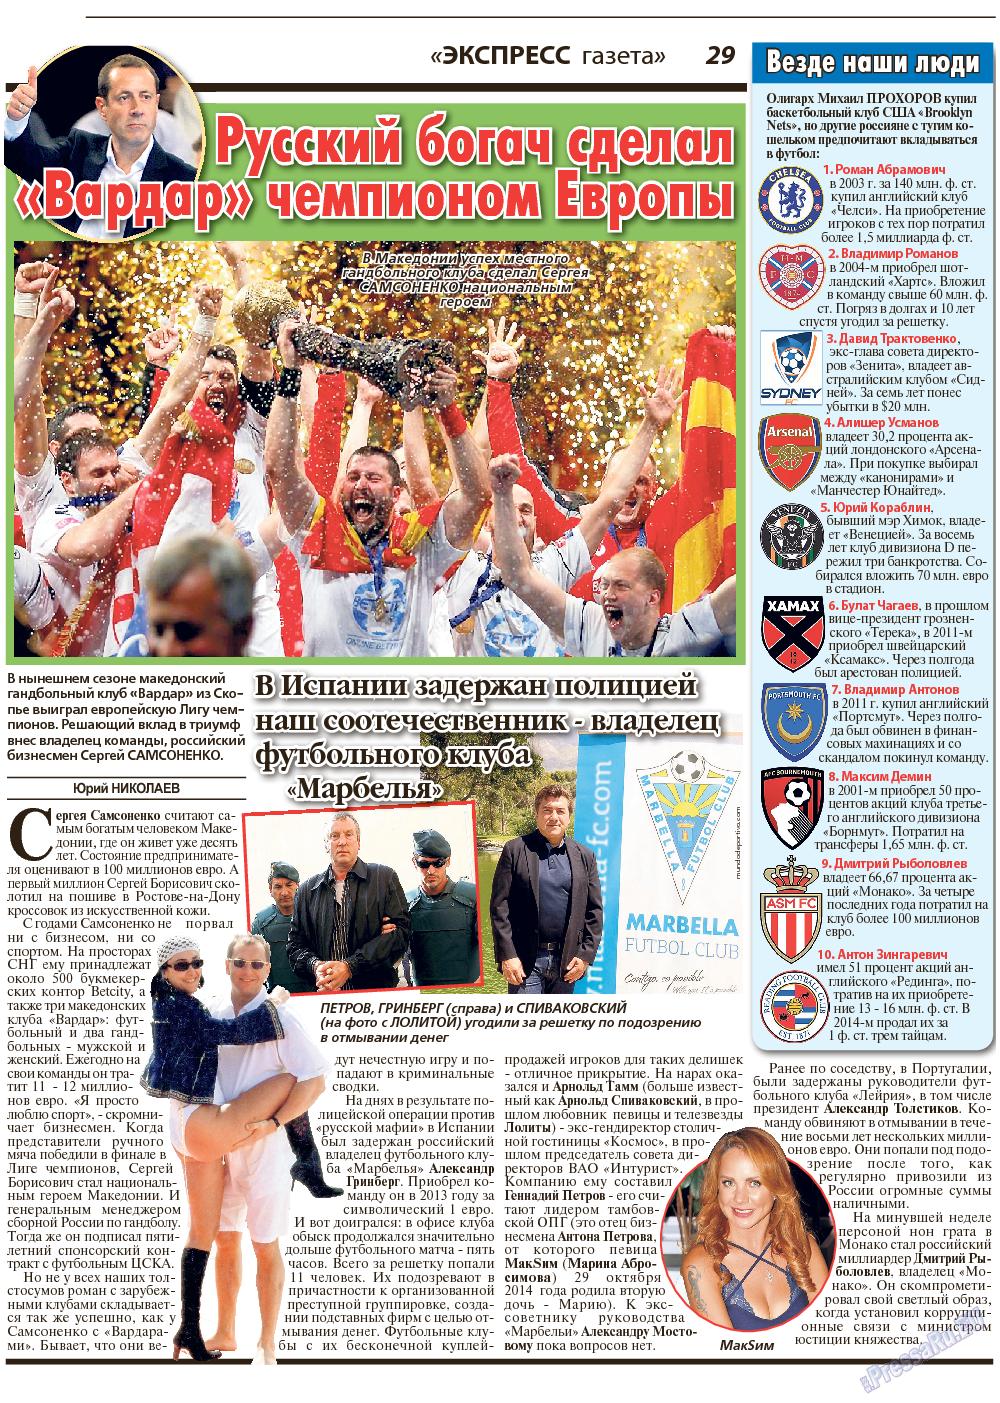 Экспресс газета (газета). 2017 год, номер 11, стр. 29